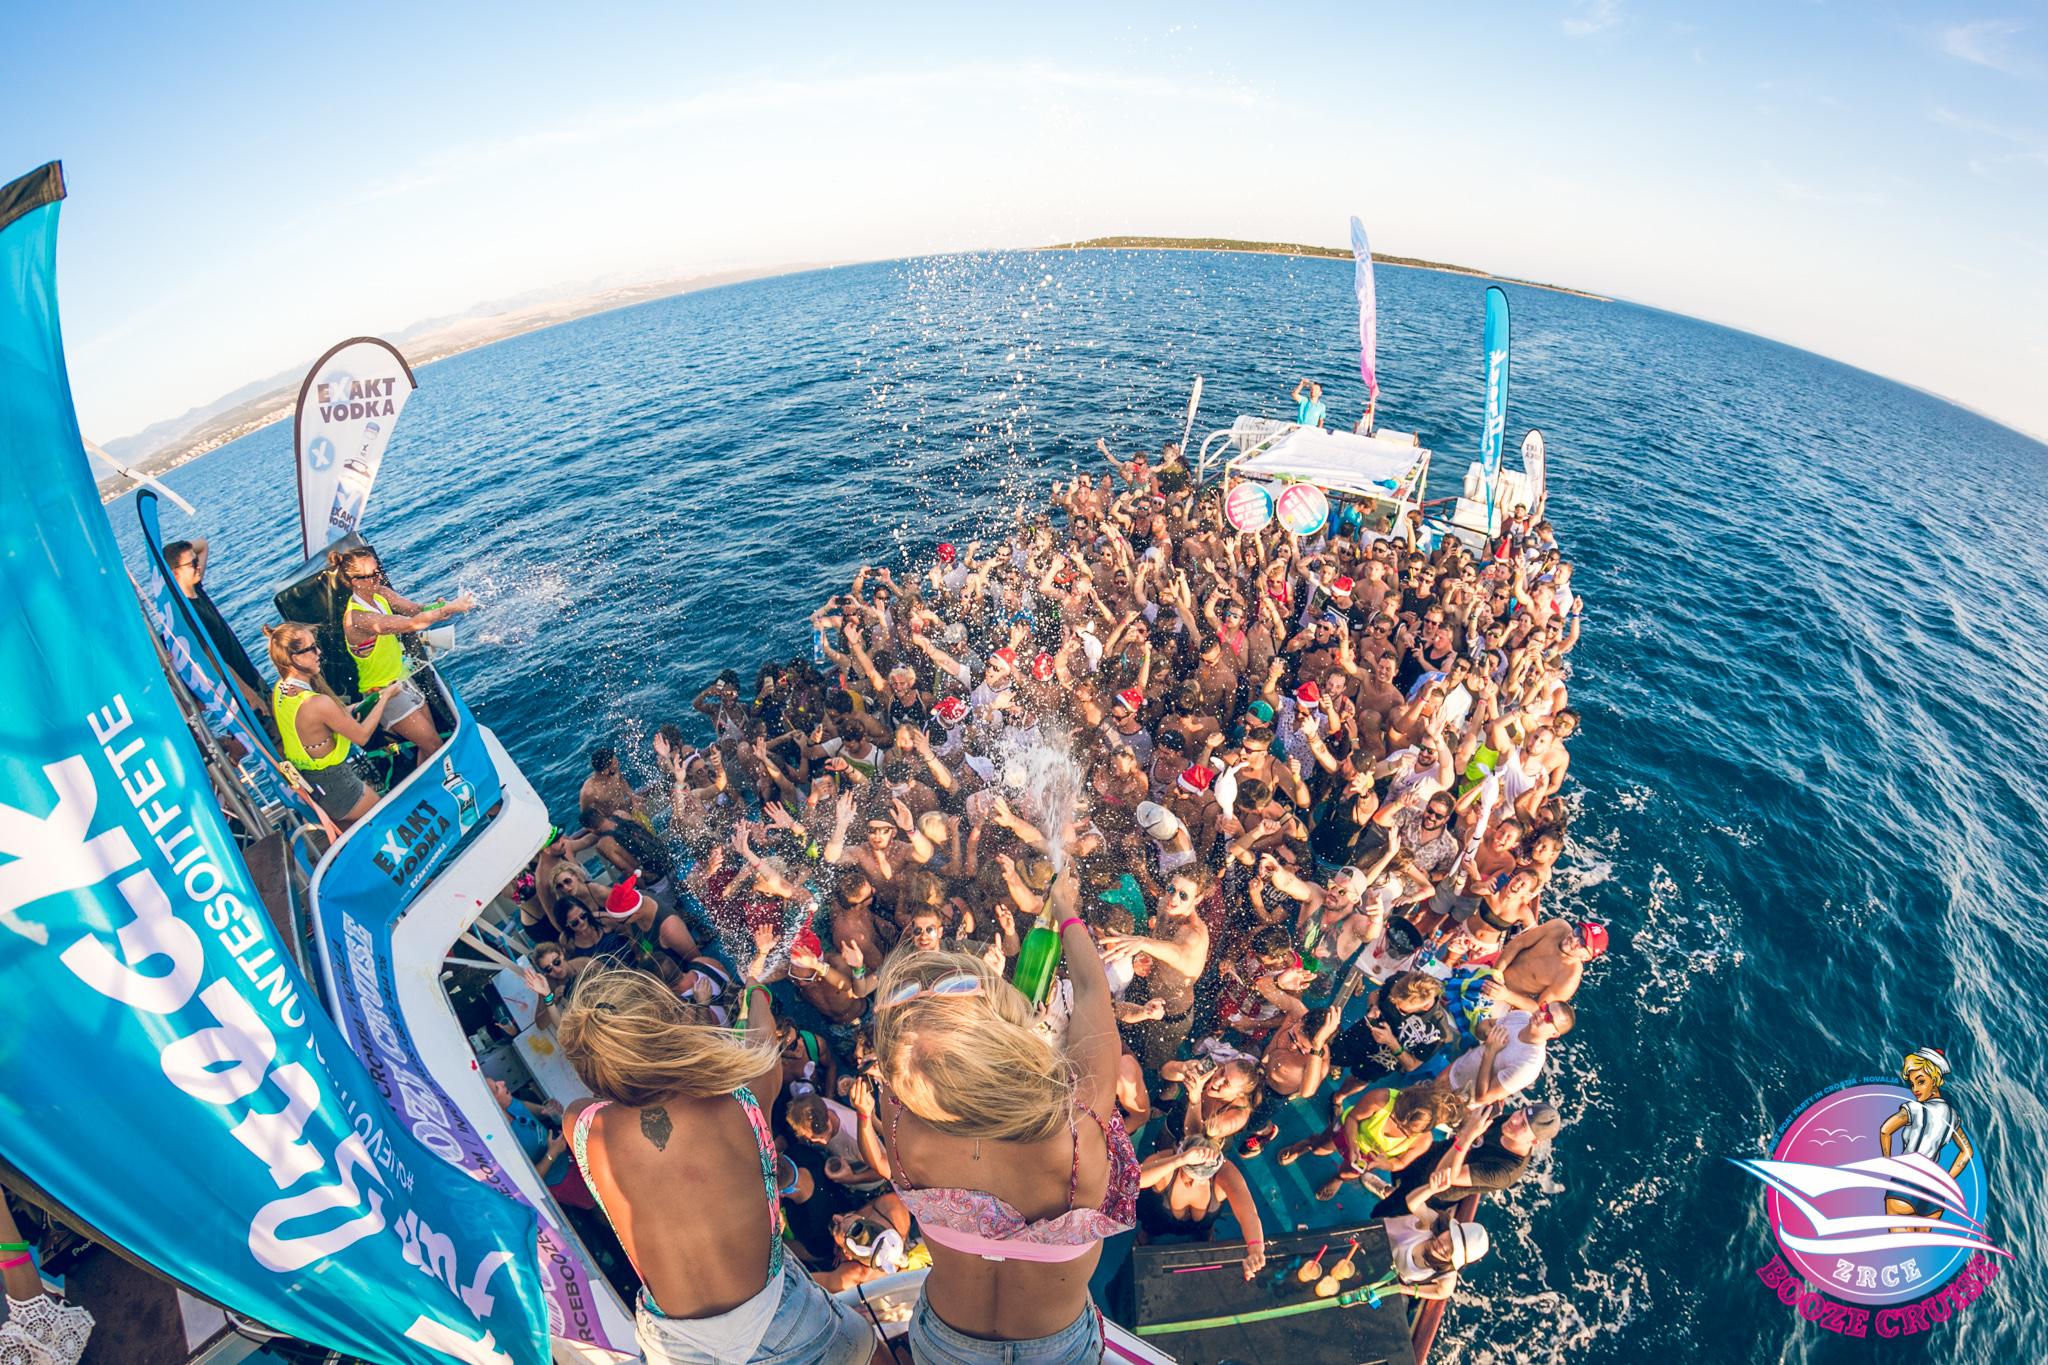 zrce-booze-cruise5